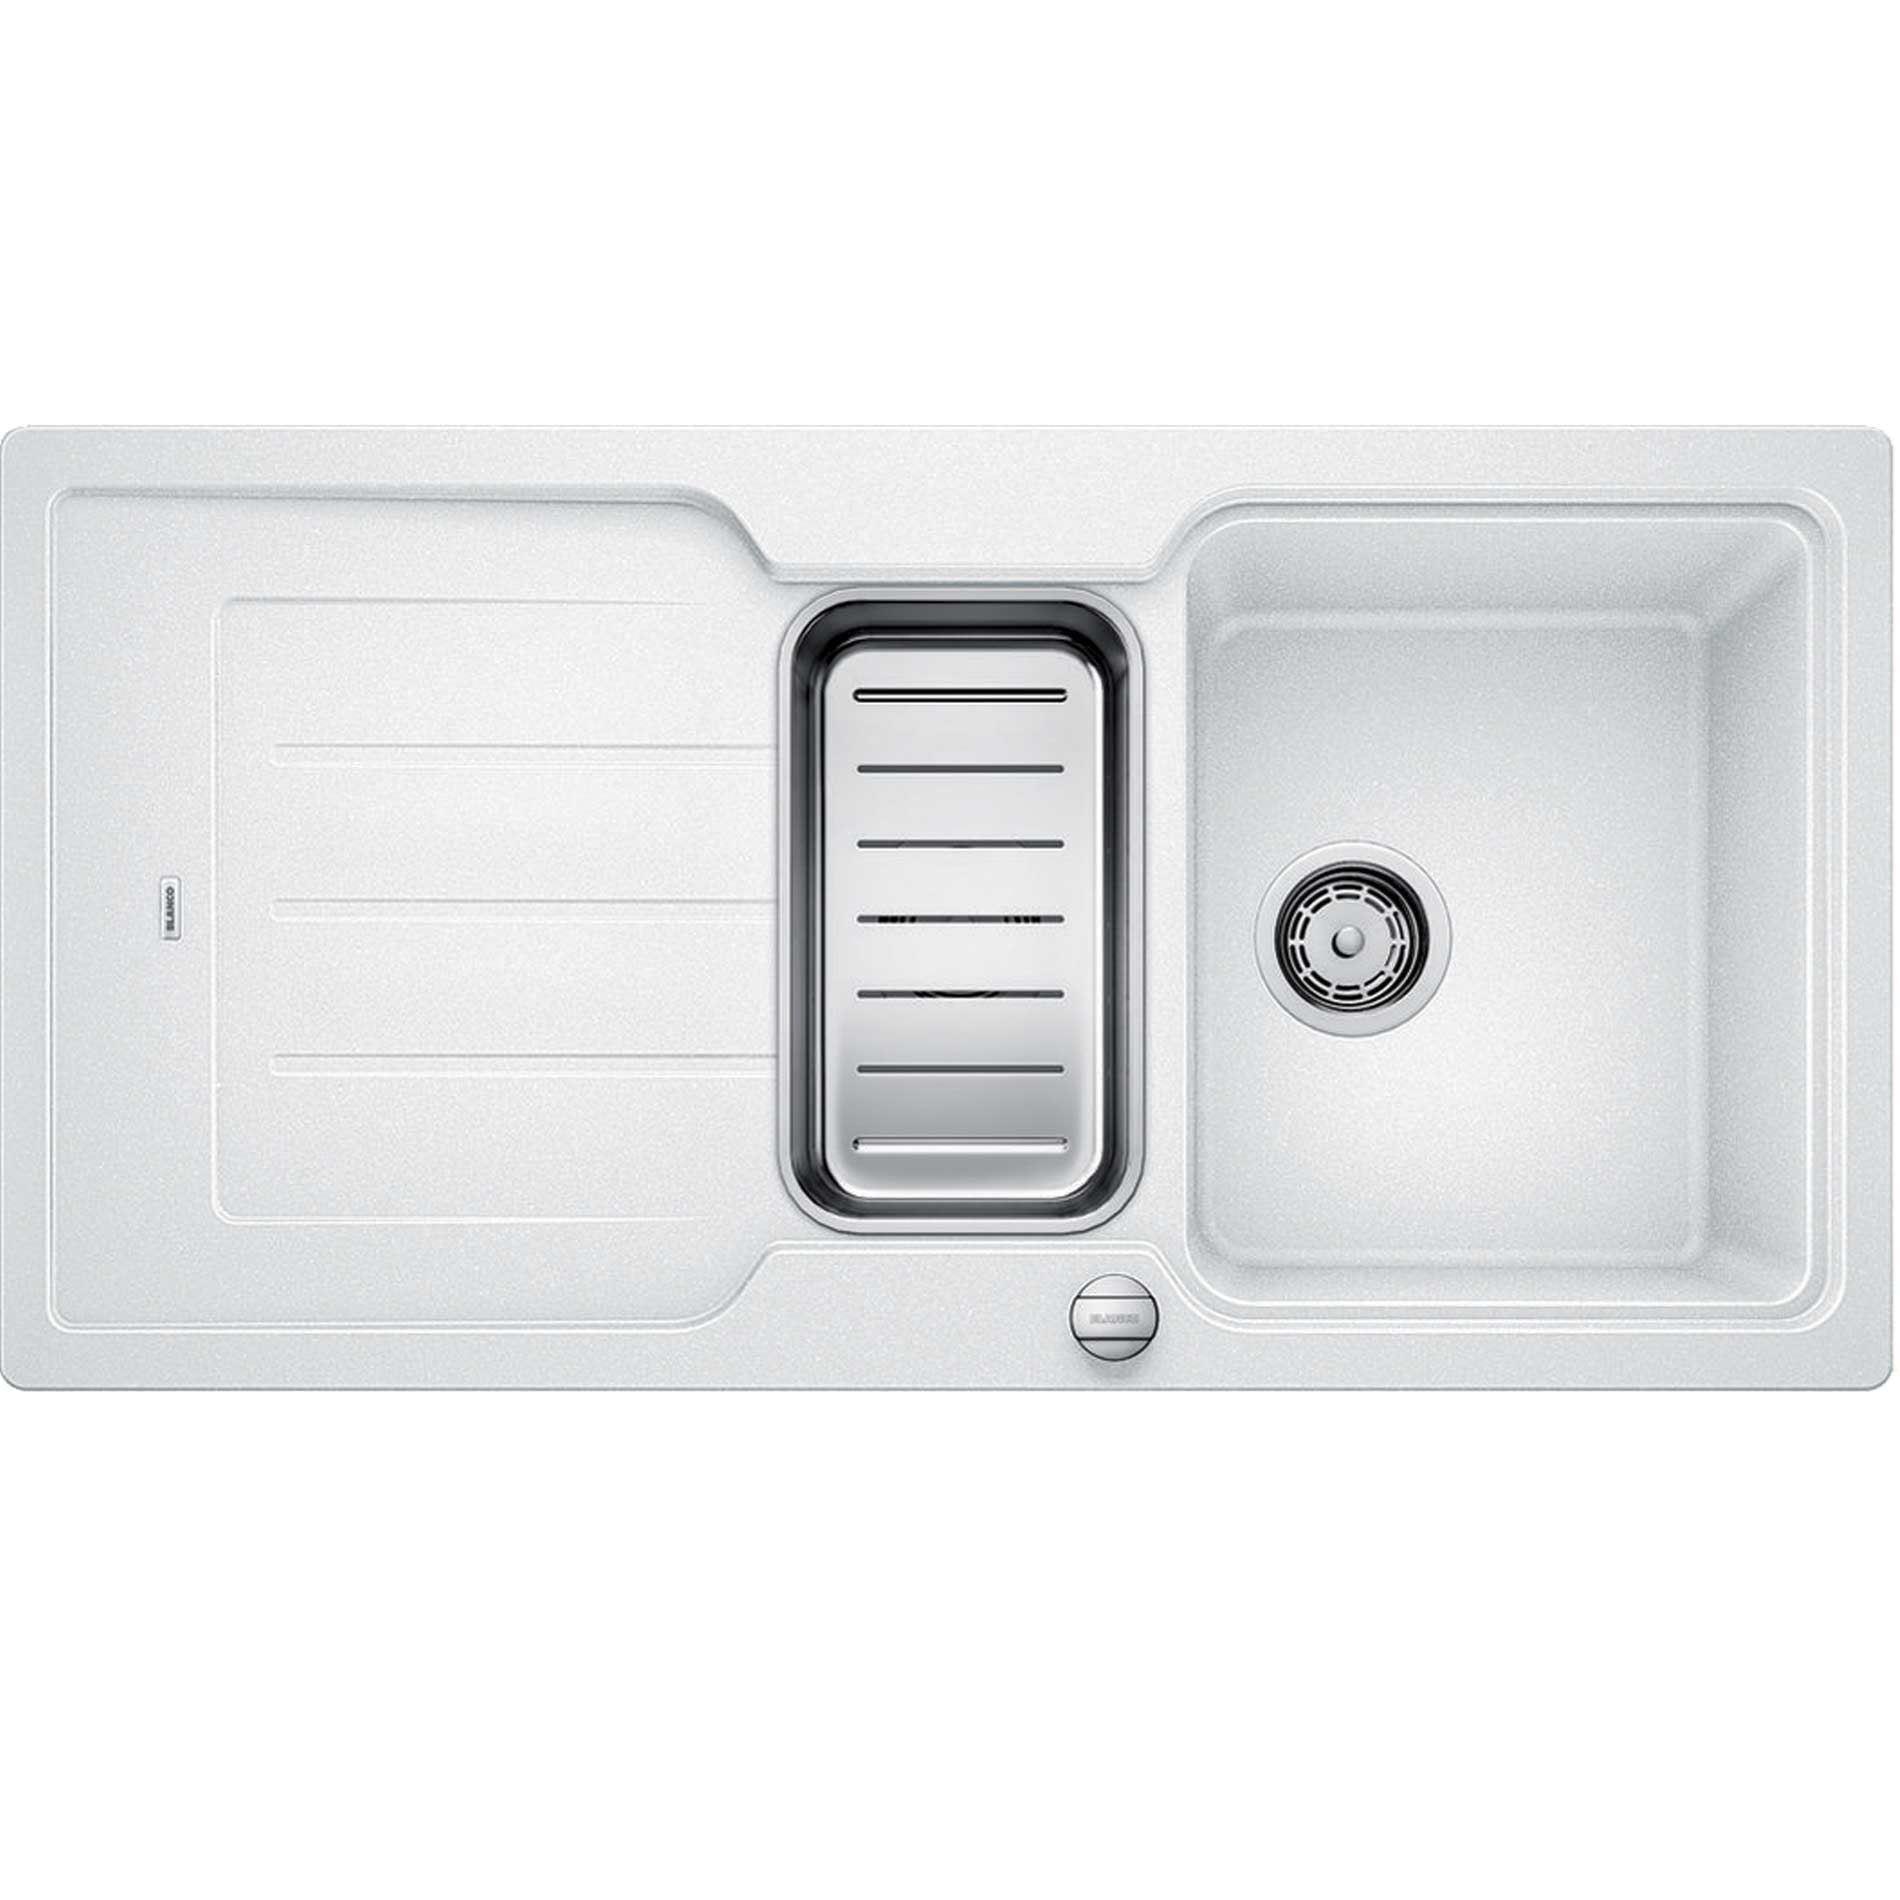 Blanco: Classic Neo 6 S White Silgranit Sink - Kitchen Sinks & Taps